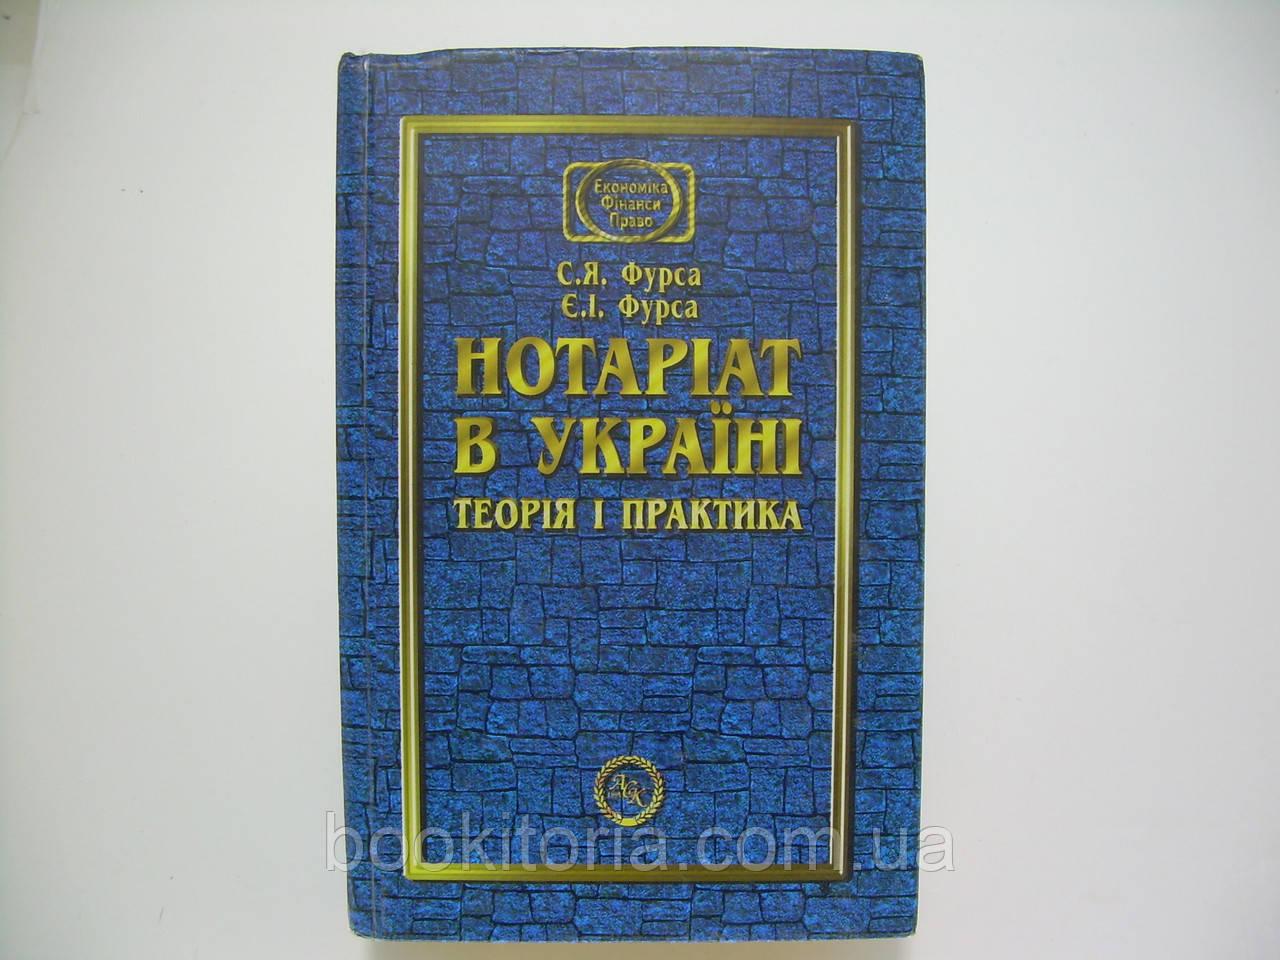 Фурса С.Я., Фурса Є.І. Нотаріат в Україні (б/у).